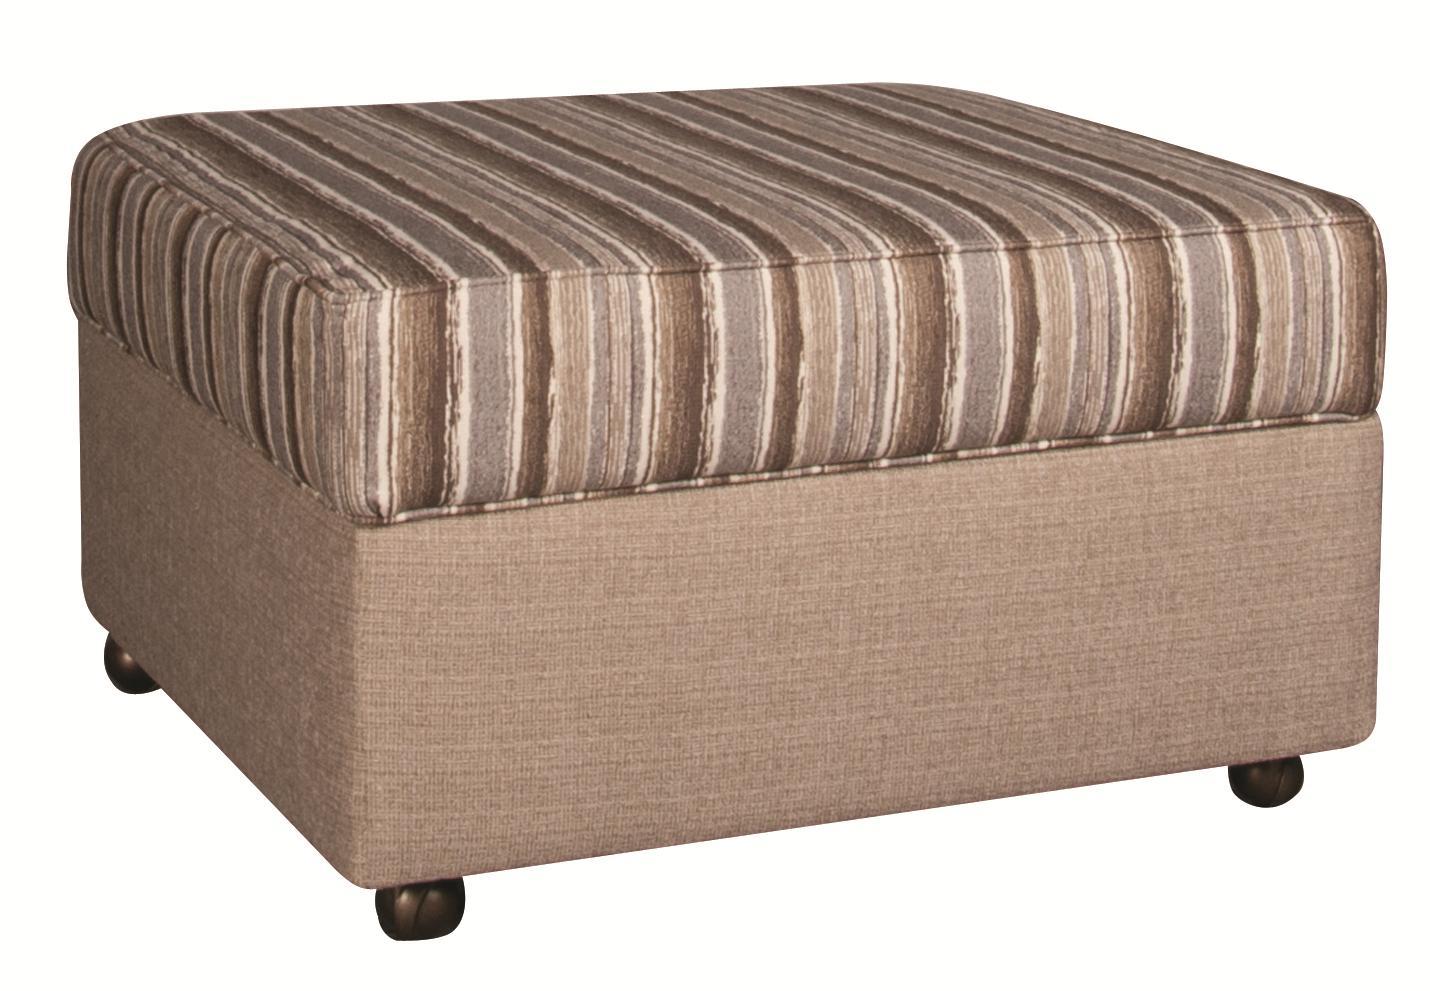 Morris Home Furnishings Bjorn Bjorn Storage Ottoman - Item Number: 145820610